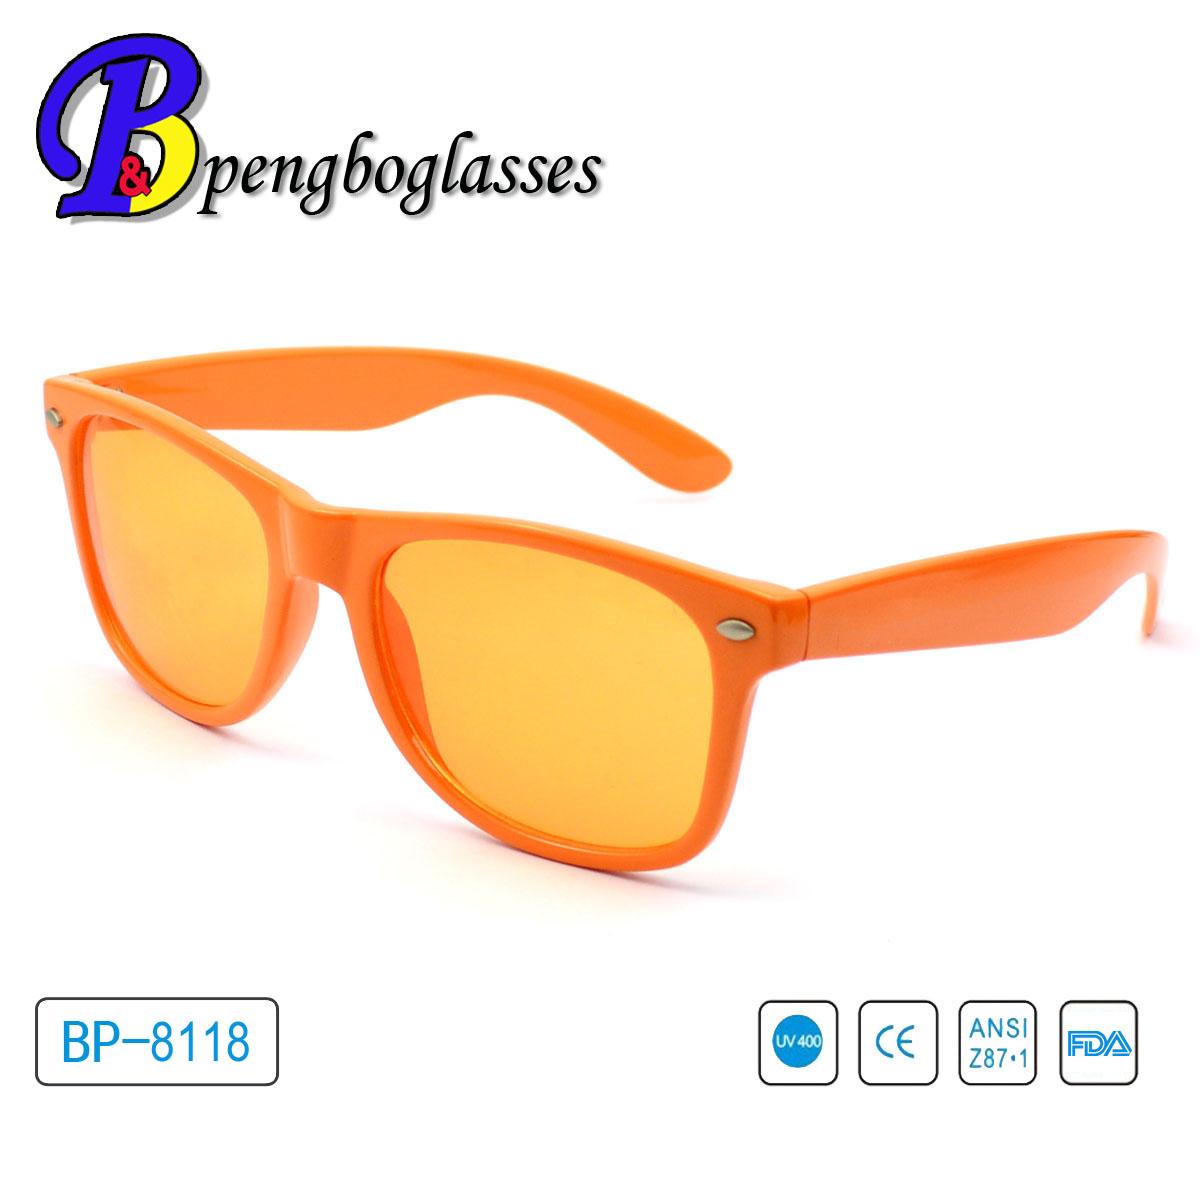 ceee7f4c81 2015 Europa Cumplimiento Plástico Naranja Sol - Buy Plástico Naranja Sol,Europa  Cumplimiento Plástico Naranja Sol,2014 Plástico Naranja Sol Product on ...